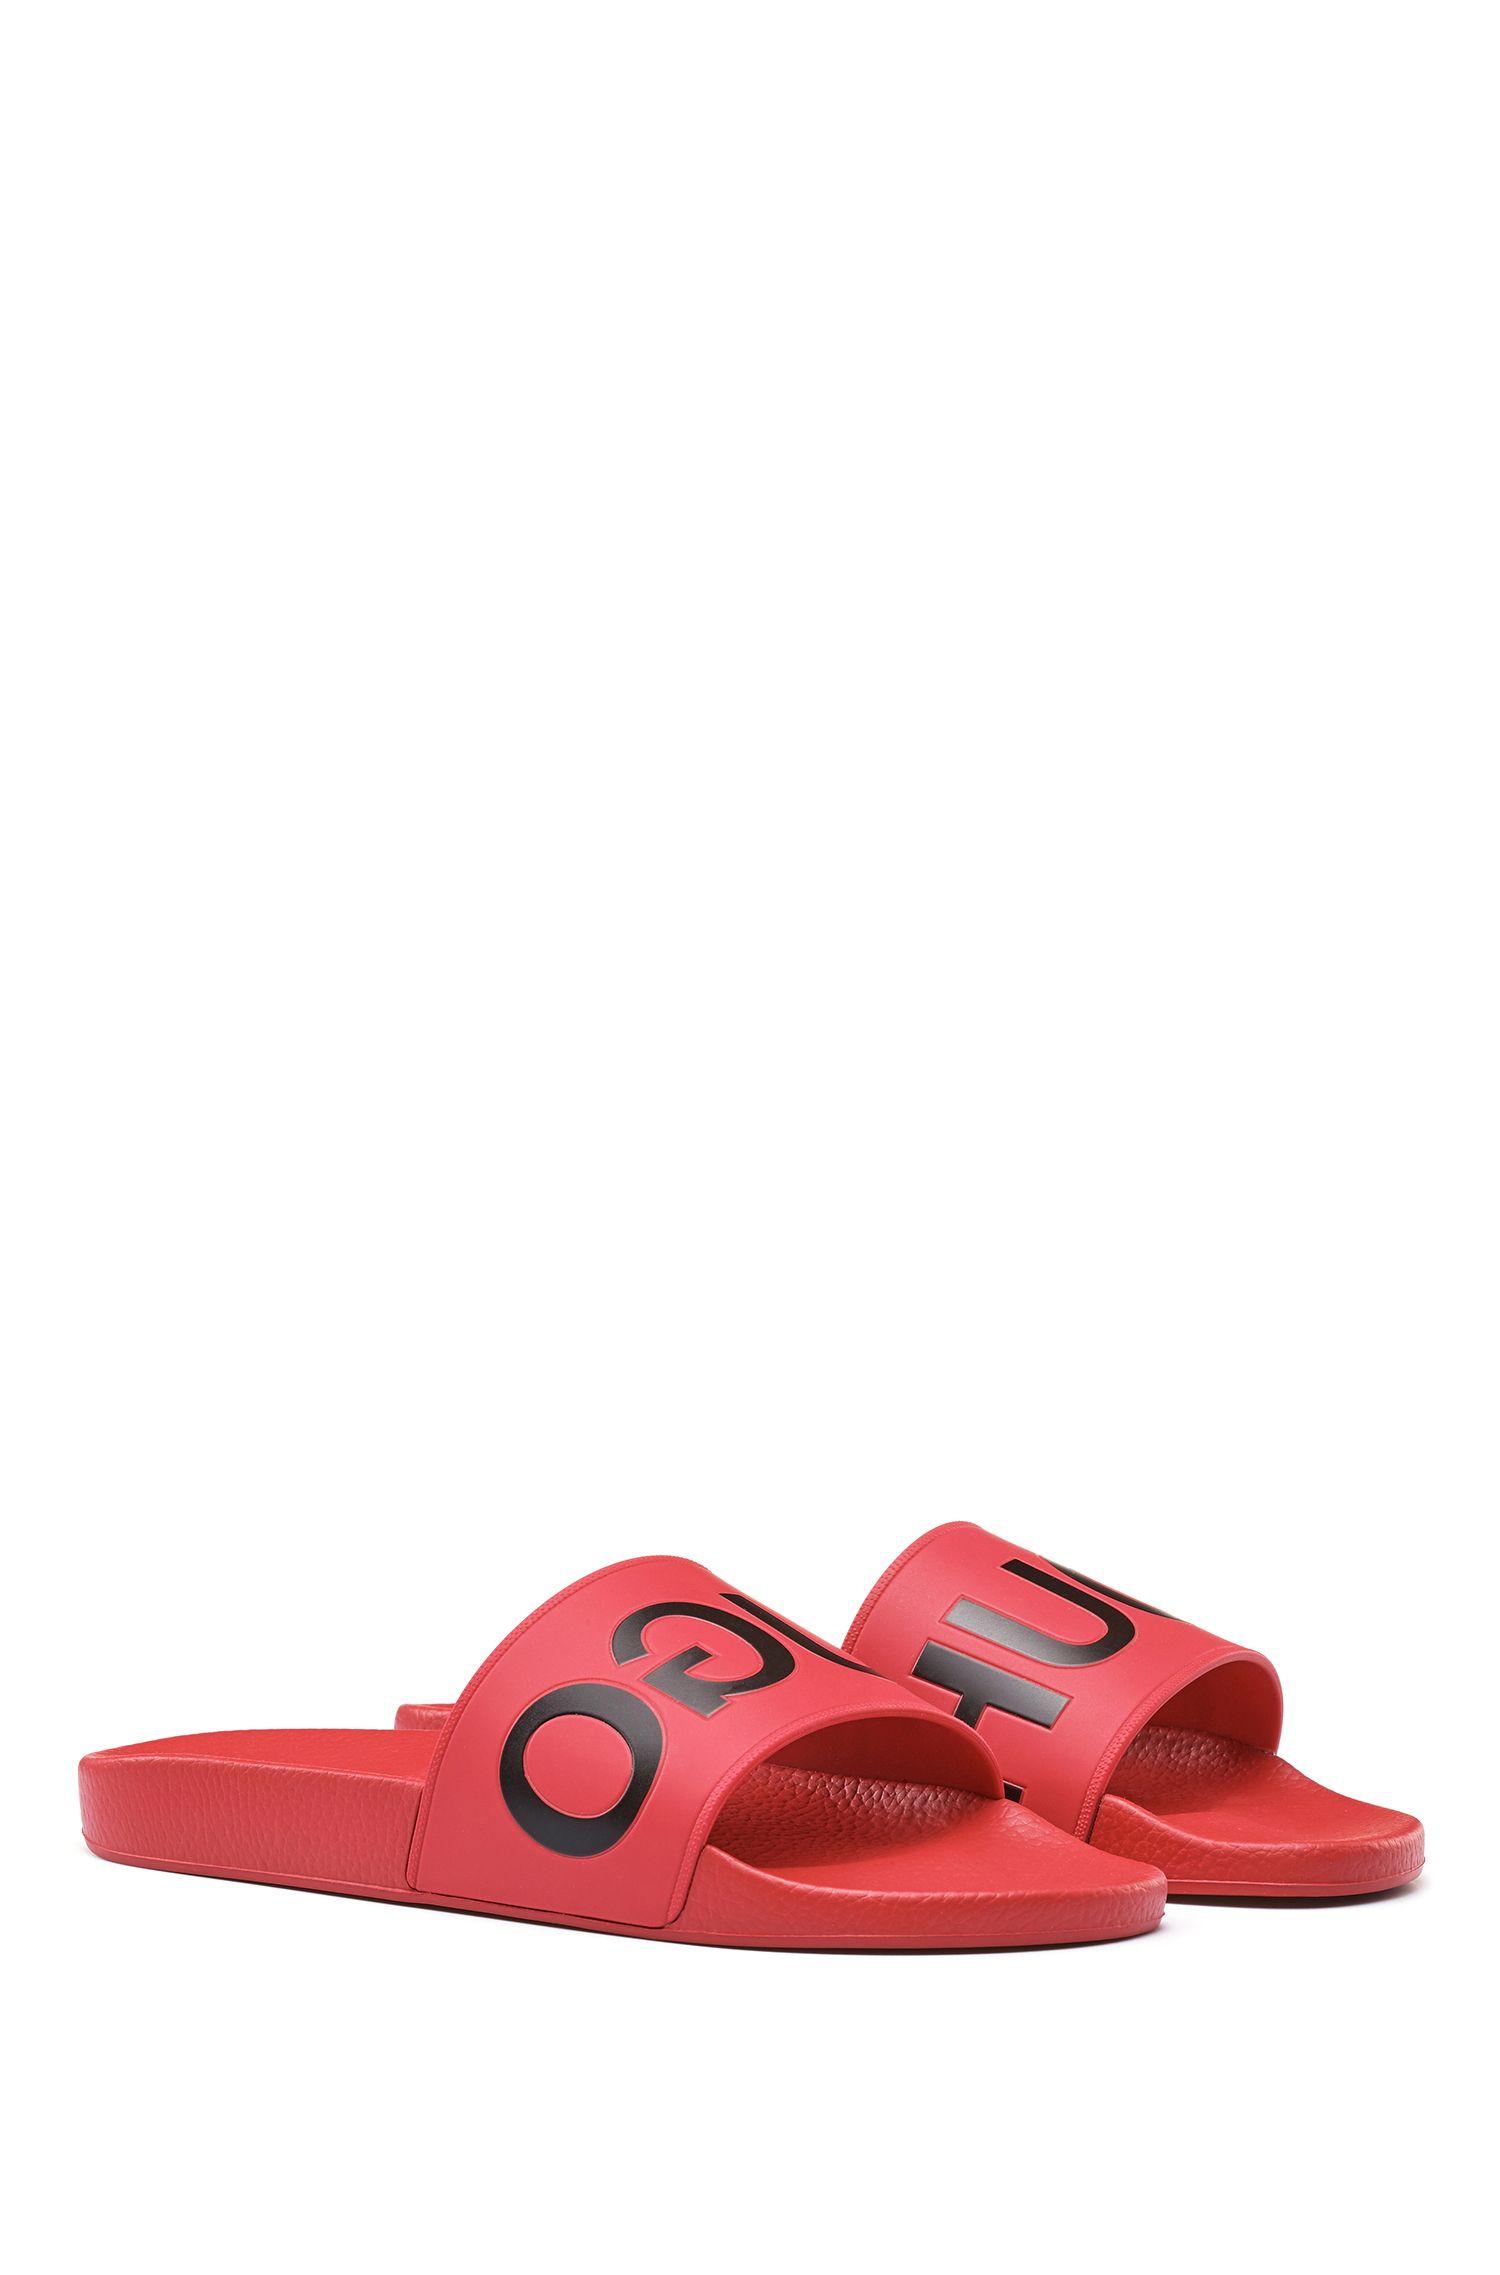 Rubber Slip-On Sandals | Timeout Slip RB